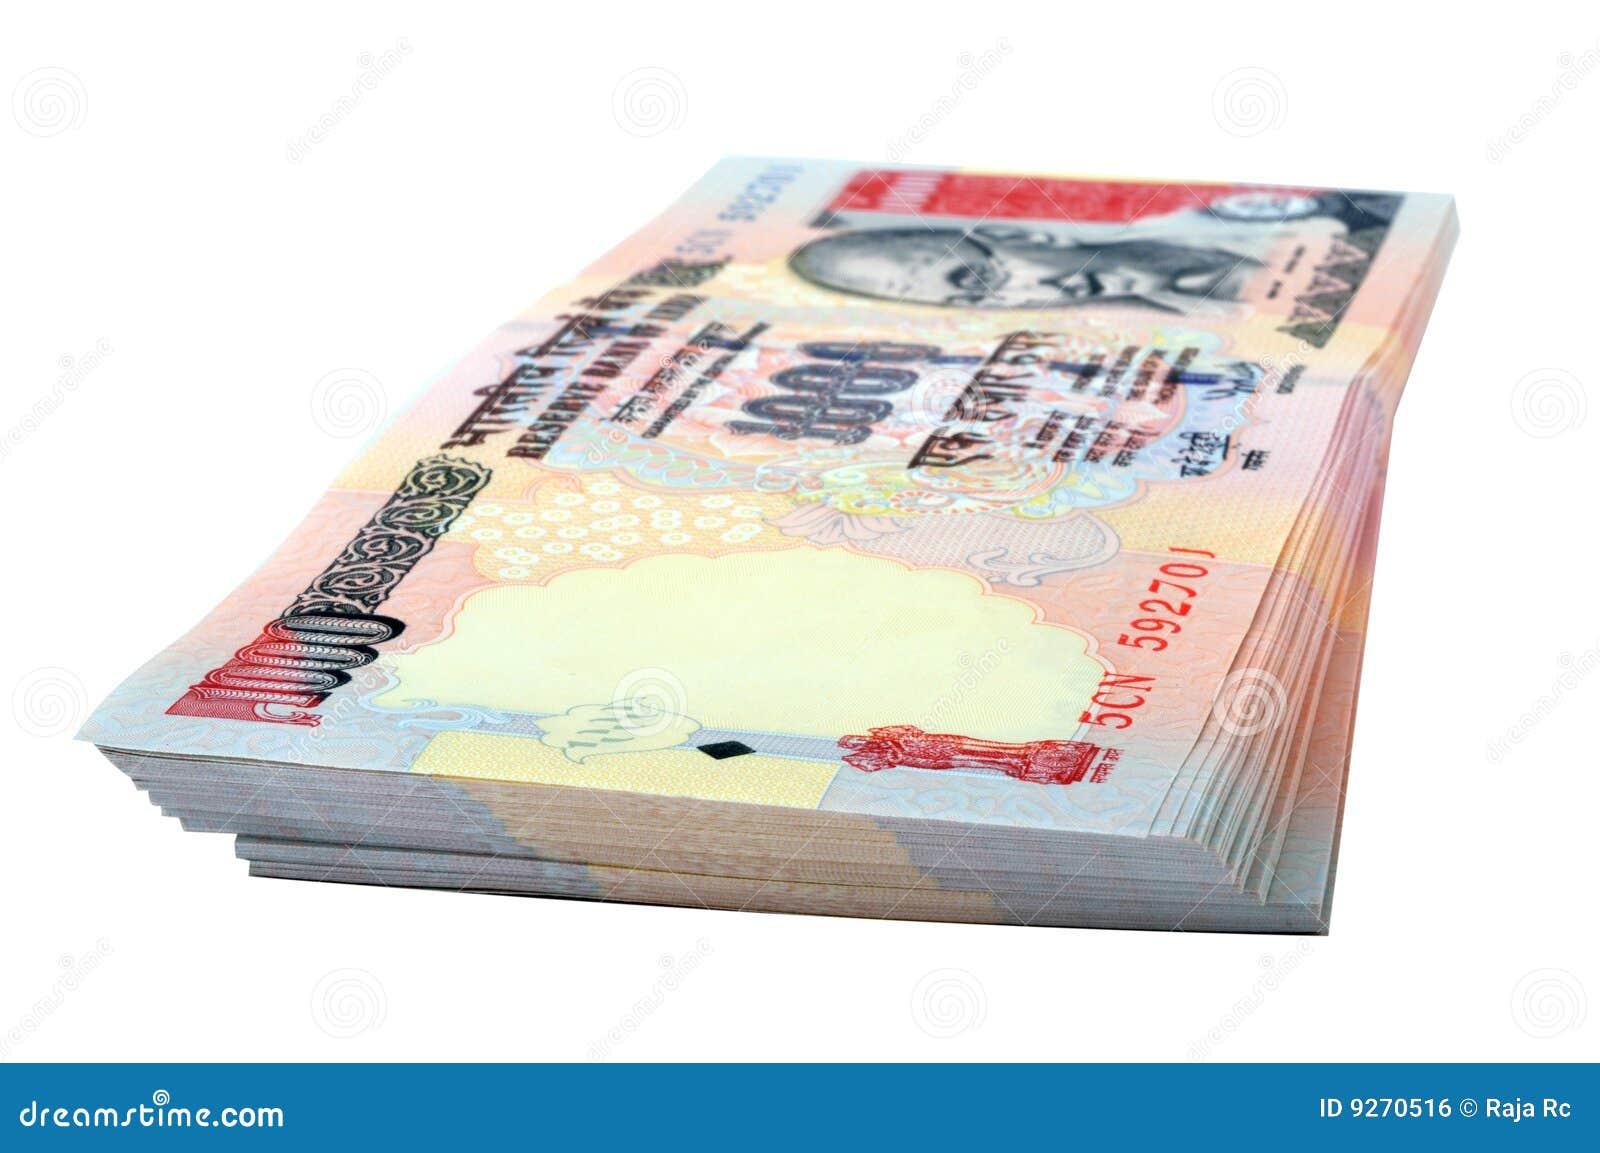 1000 indian rupee wallpaper